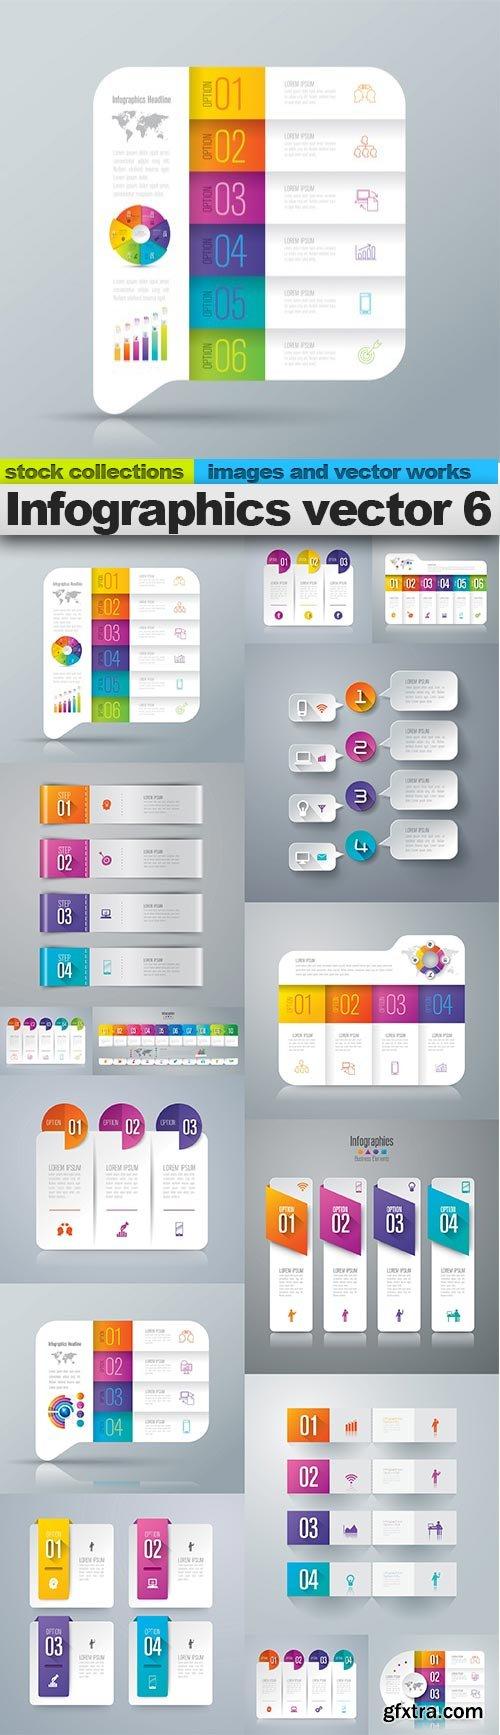 Infographics vector 6, 15 X EPS